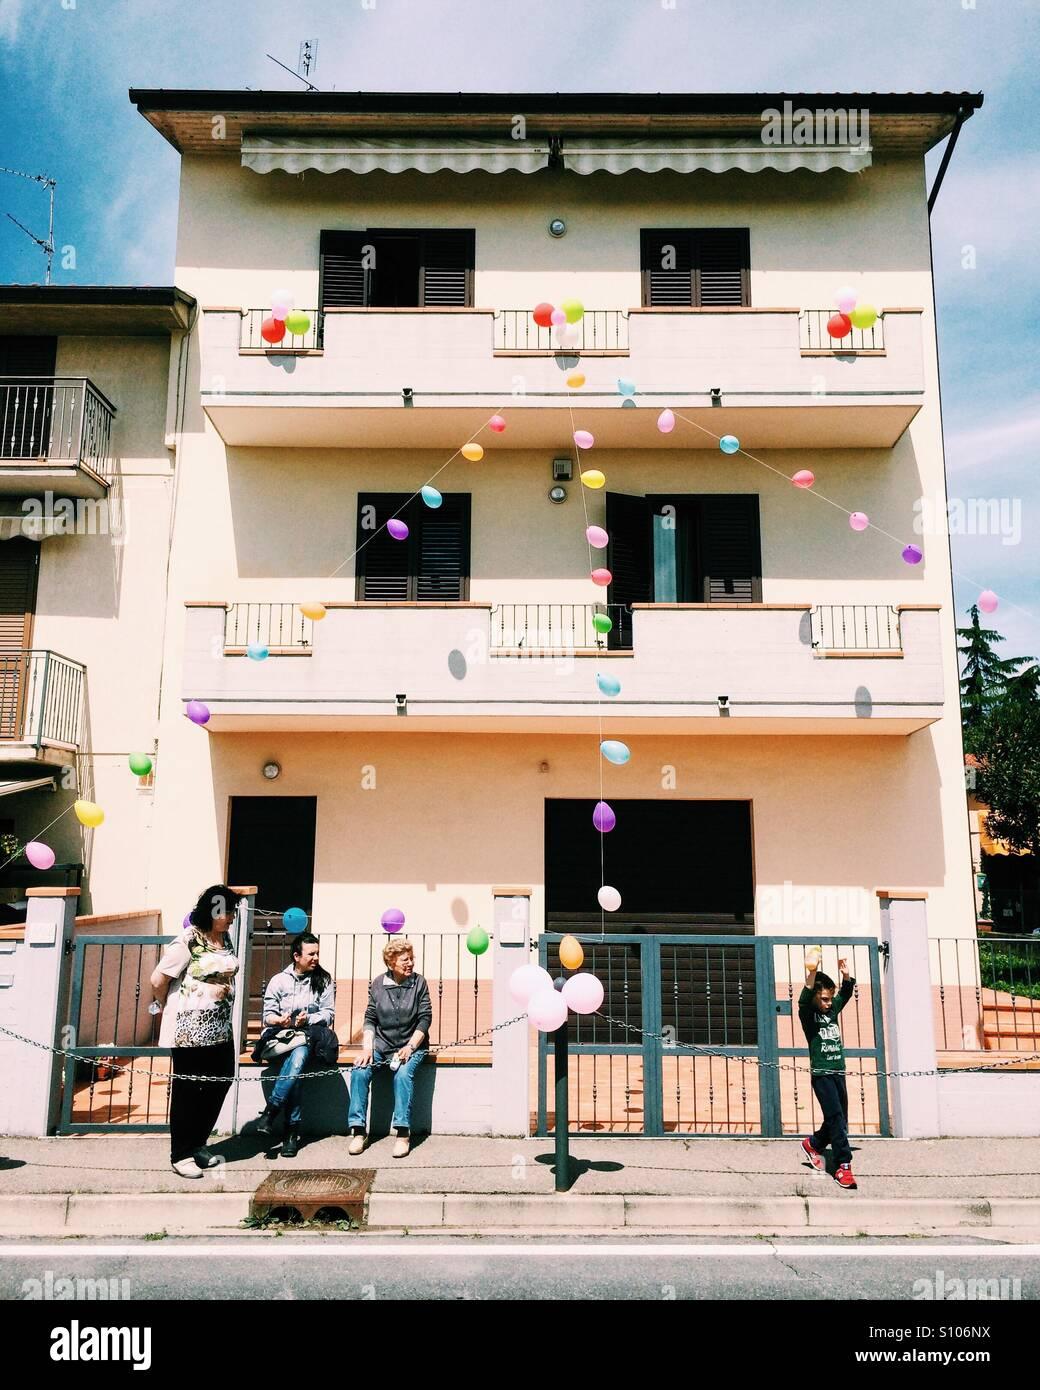 Los residentes de Quarata en Toscana preparando adornos para el Giro d'Italia 2016. Imagen De Stock